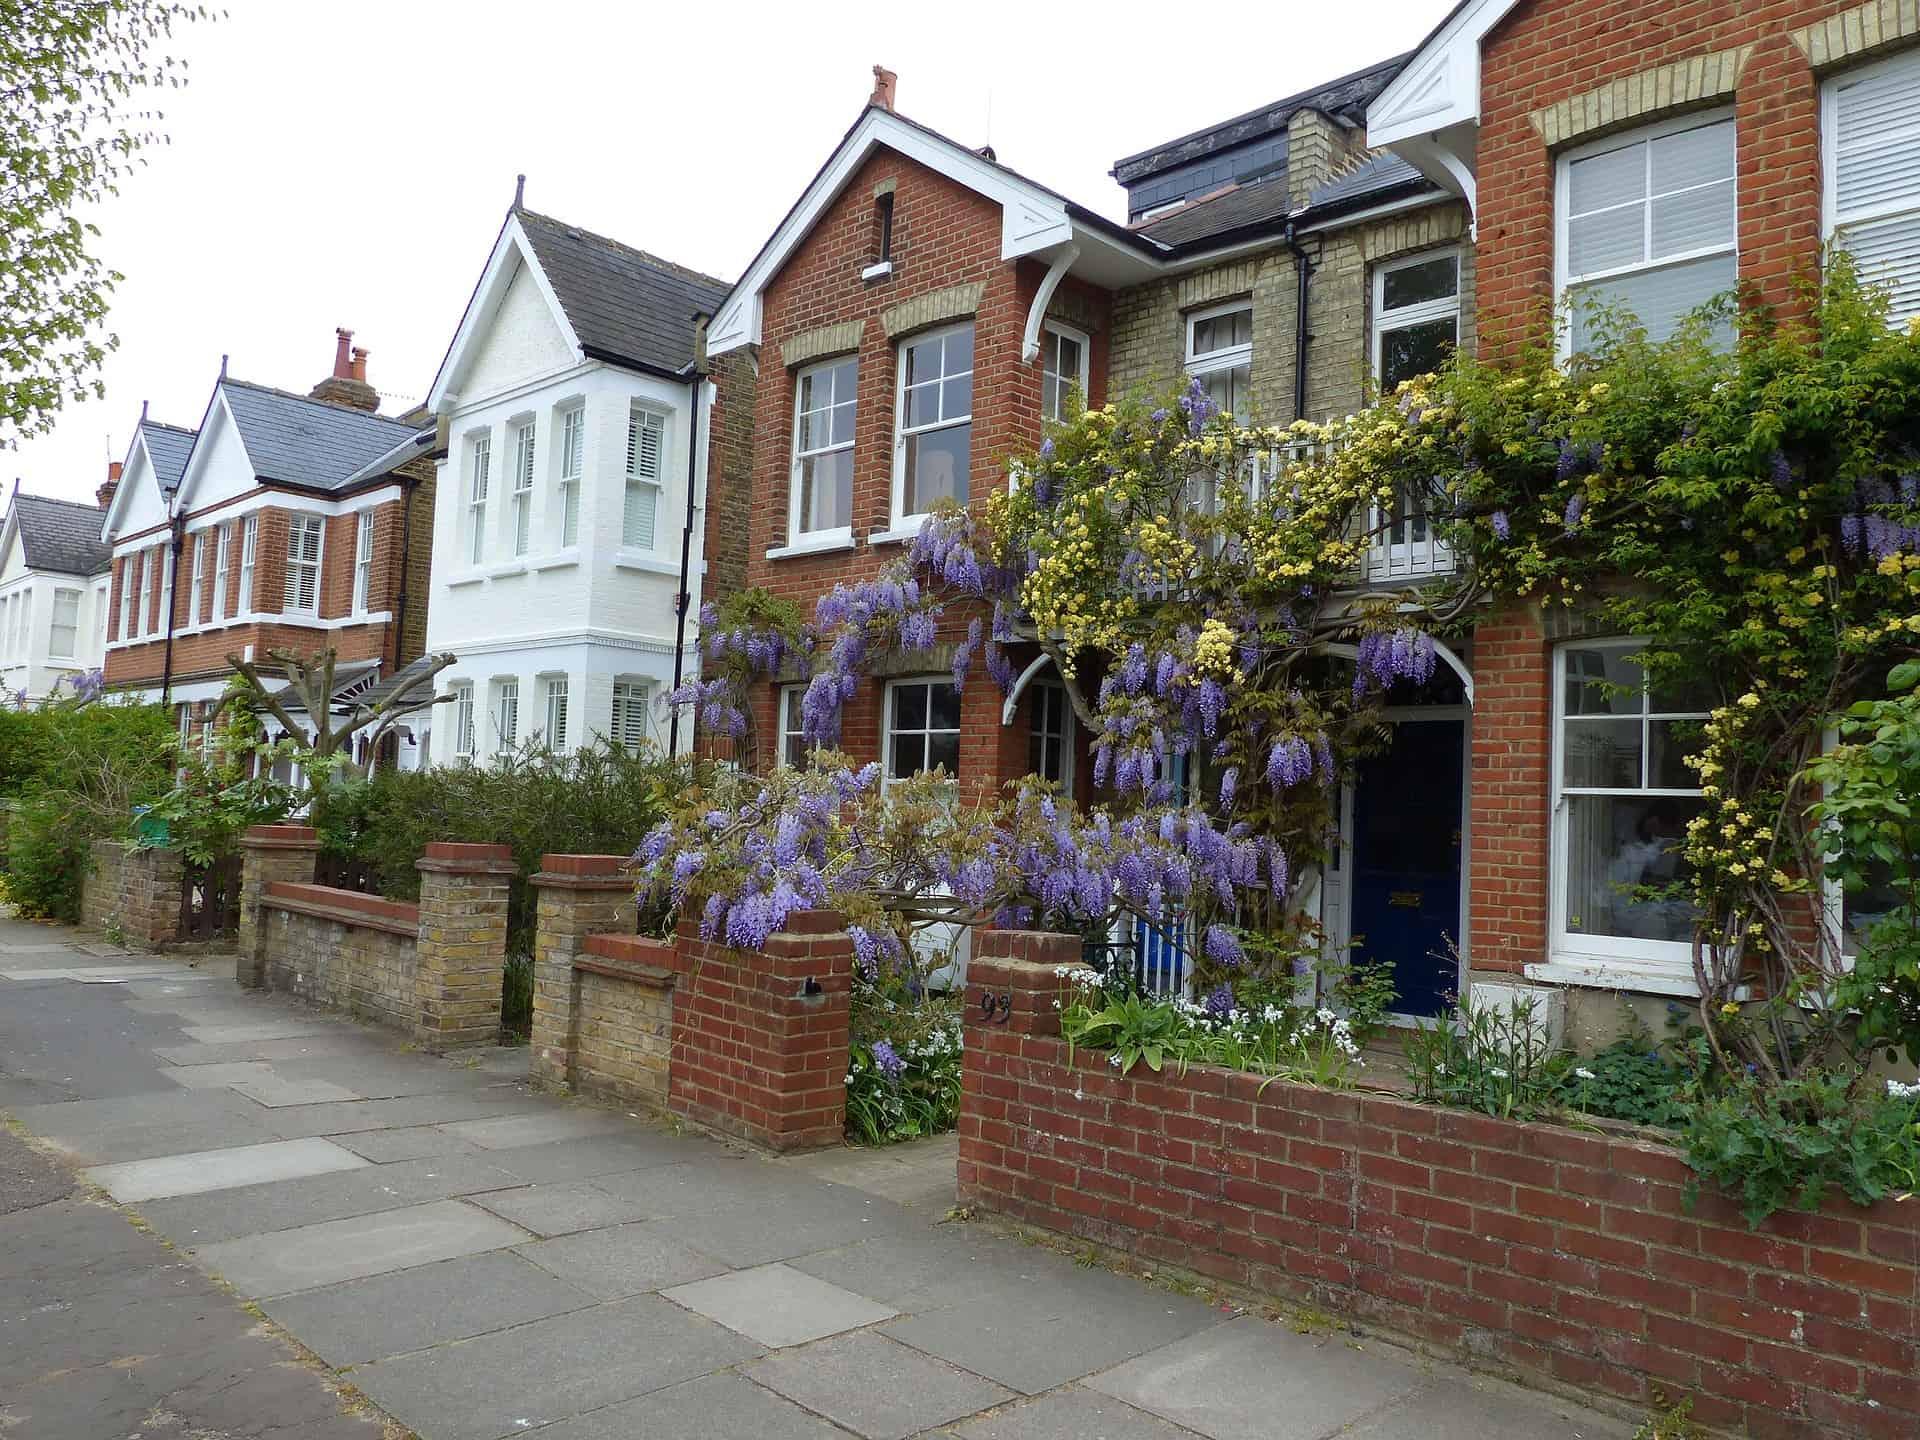 Home survey for visa in Cambridge